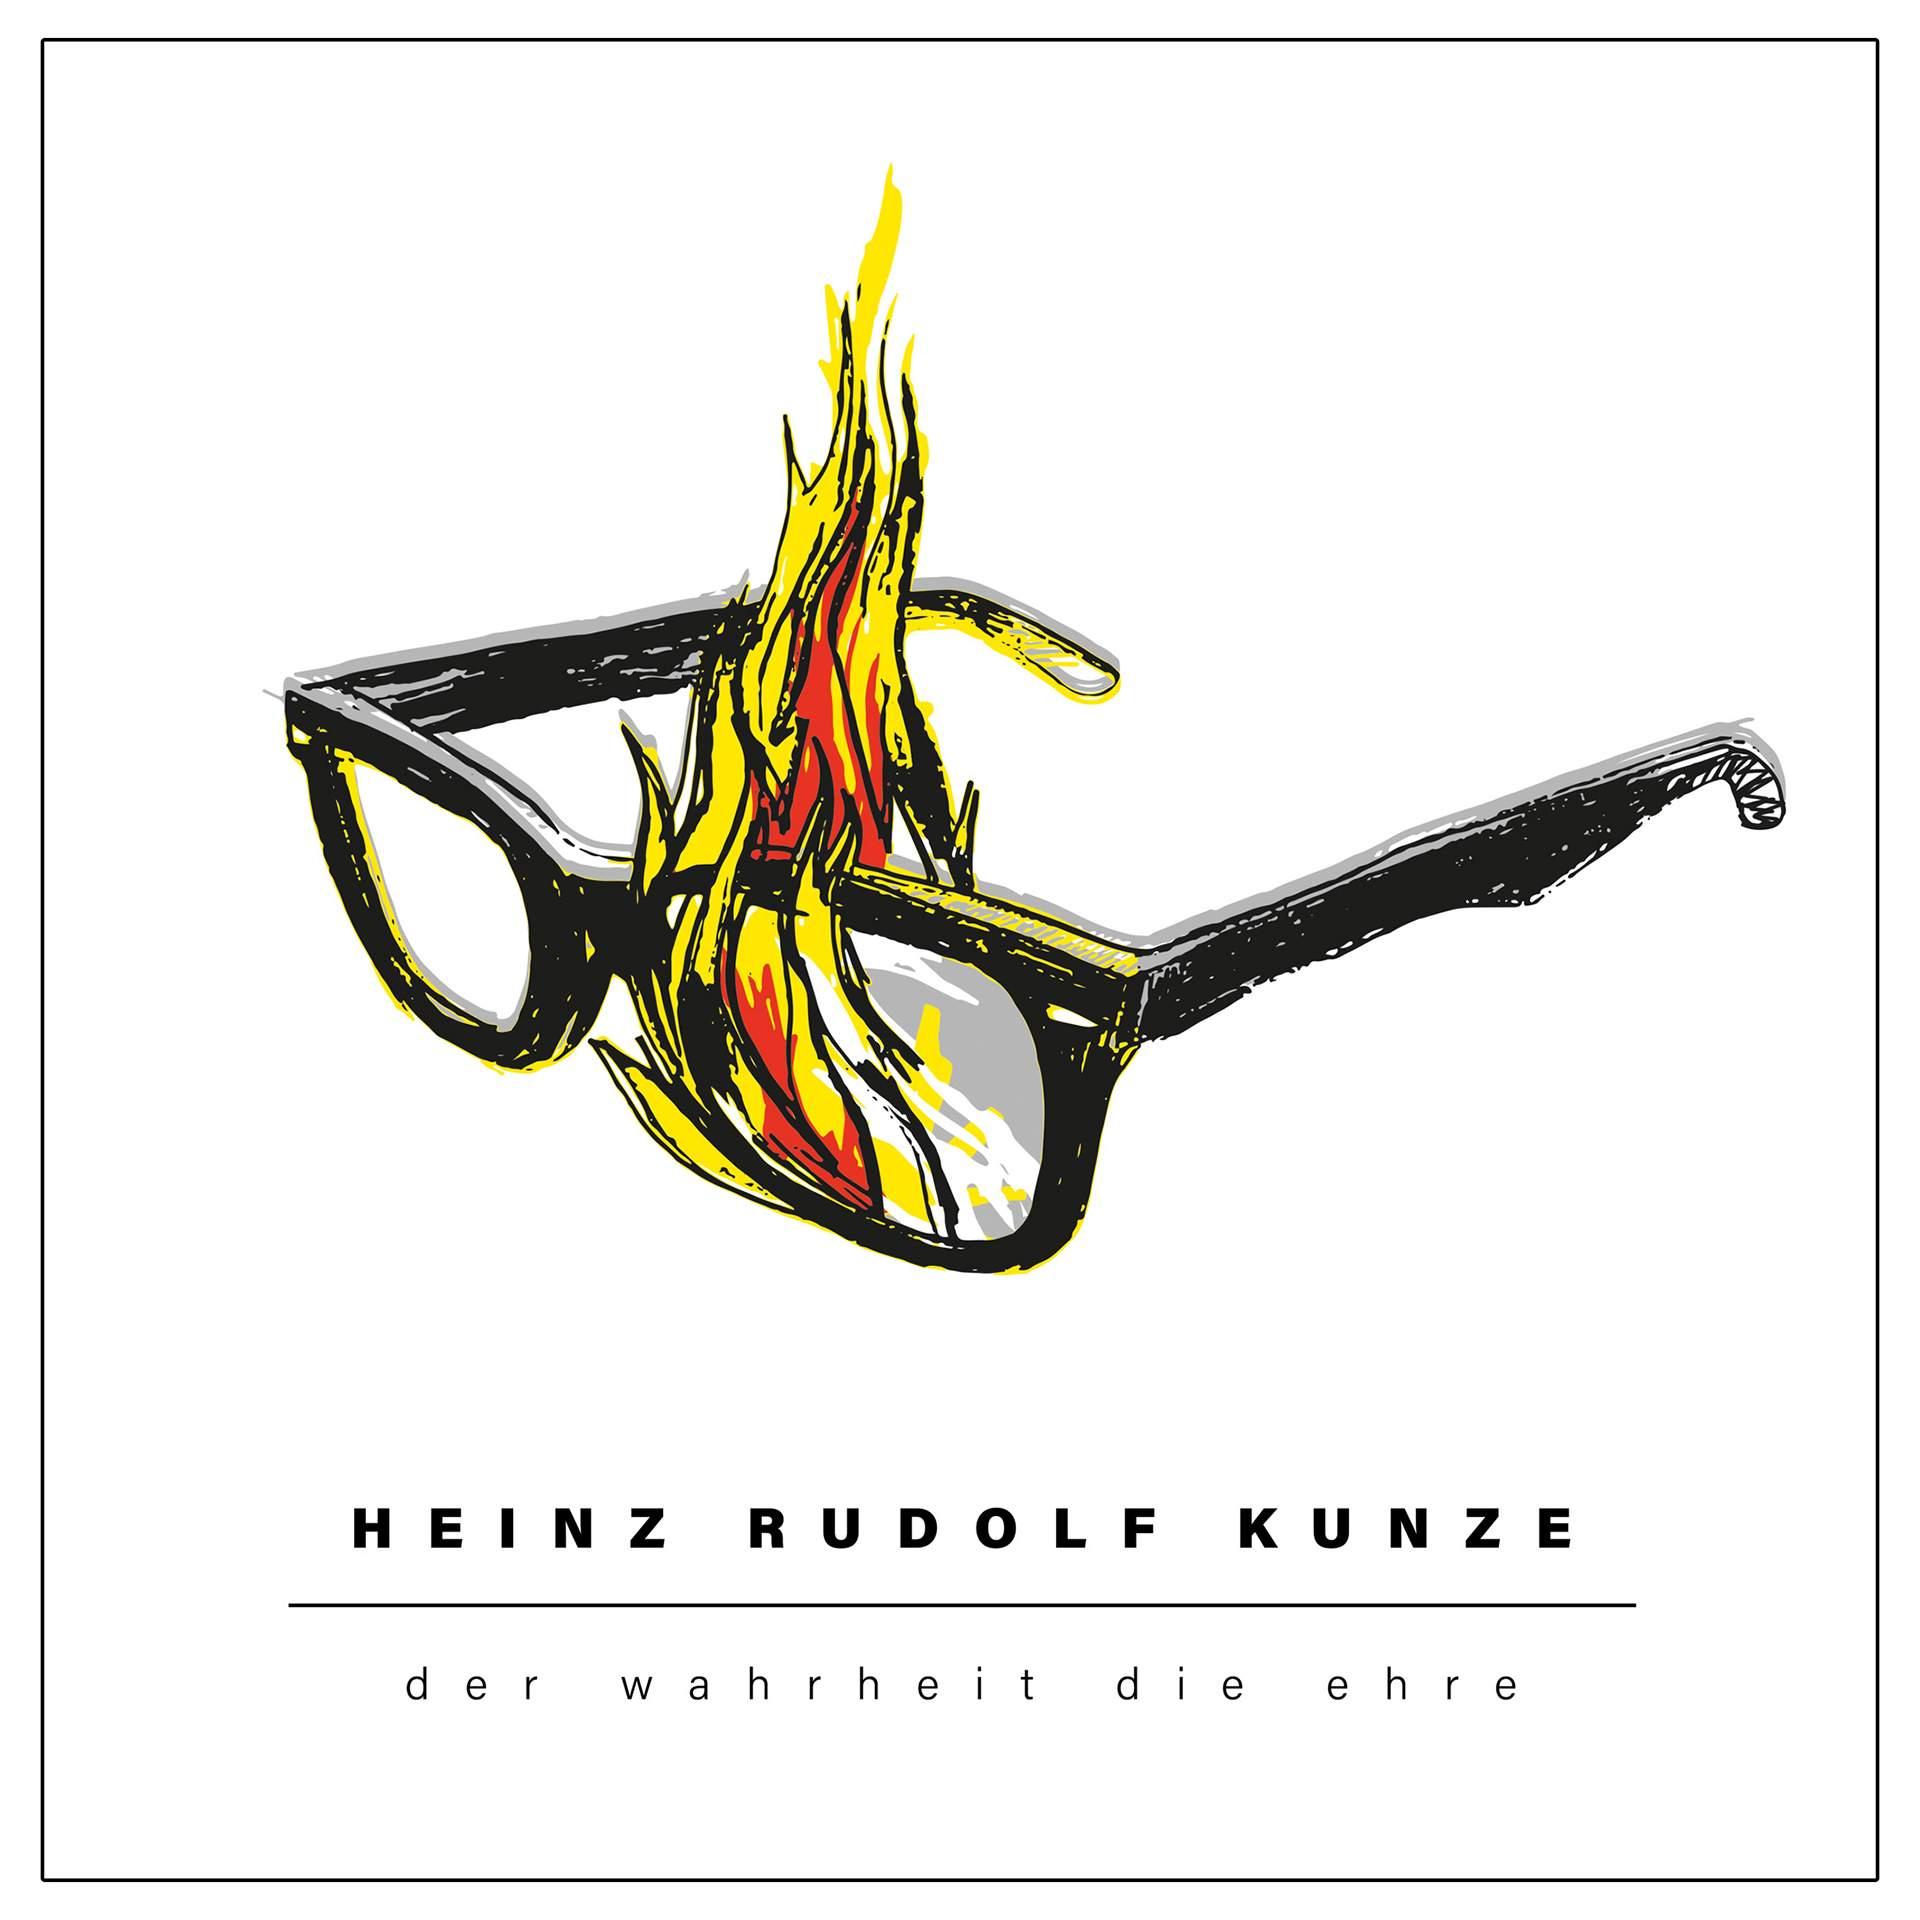 v 01 Heinz Rudolf Kunze 2020 1 Mawi